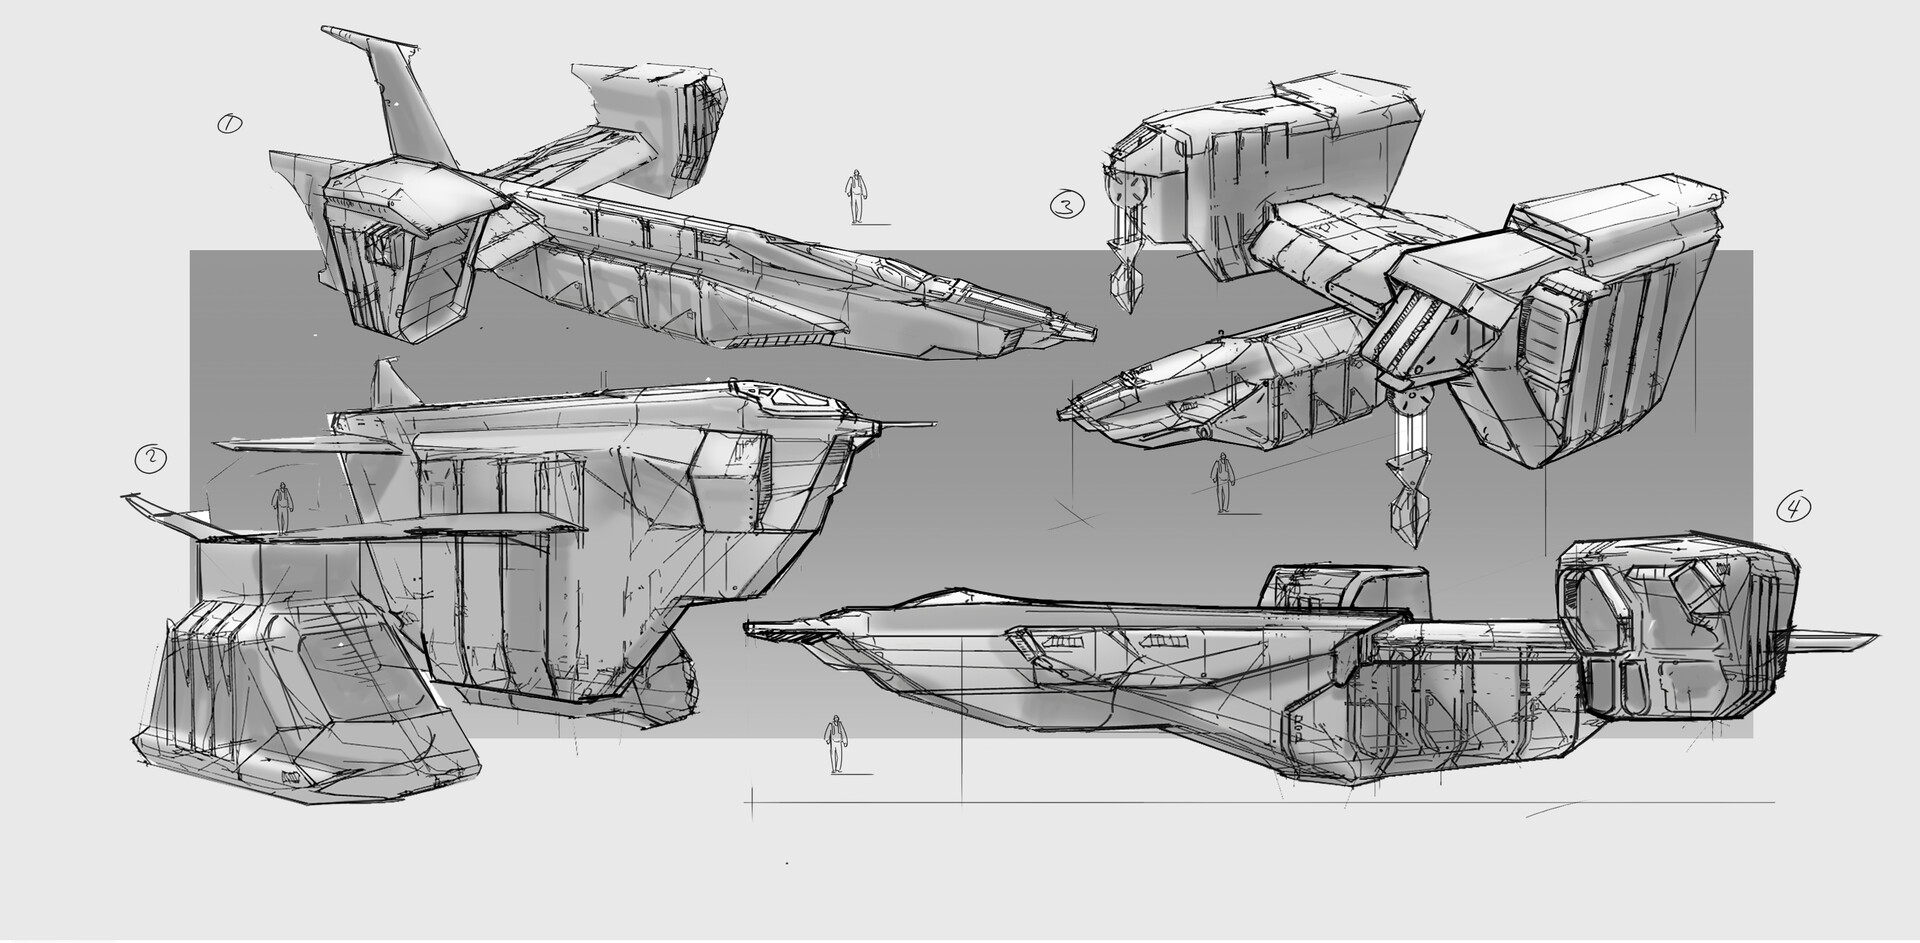 Henrik lundblx gp ship concepts